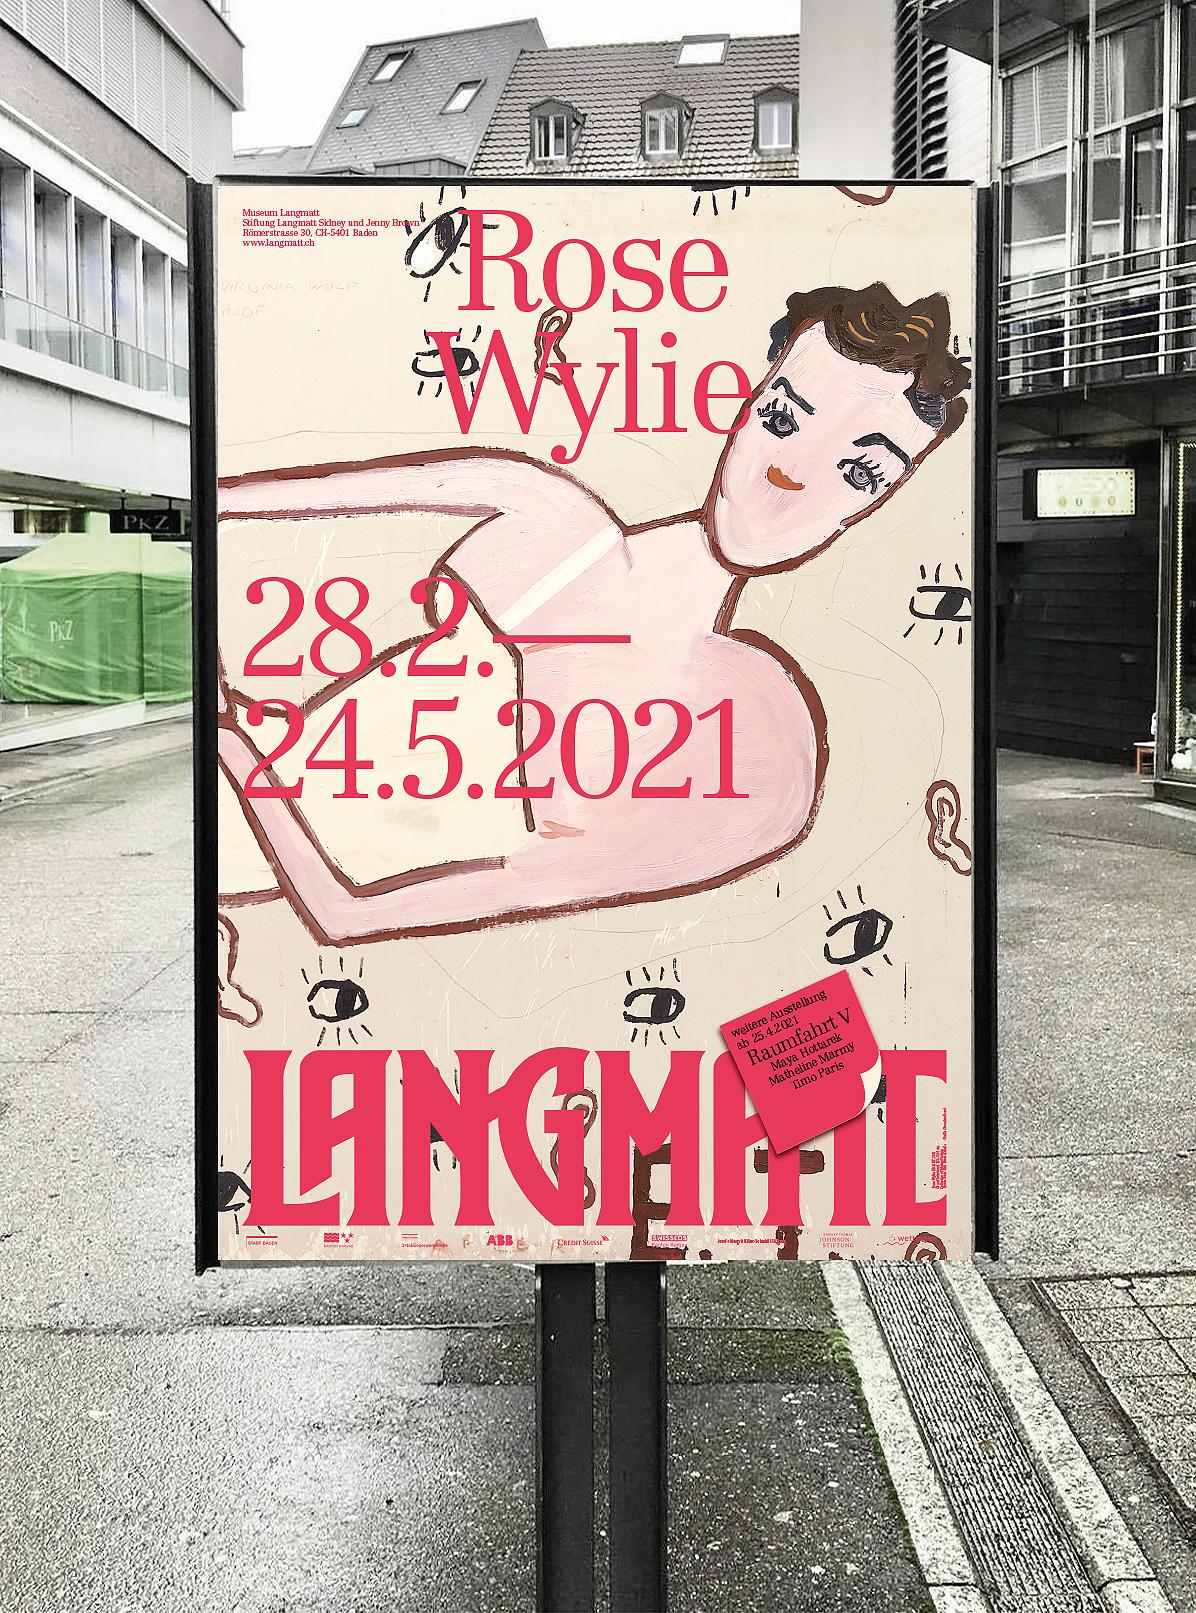 F4 Rose Wylie